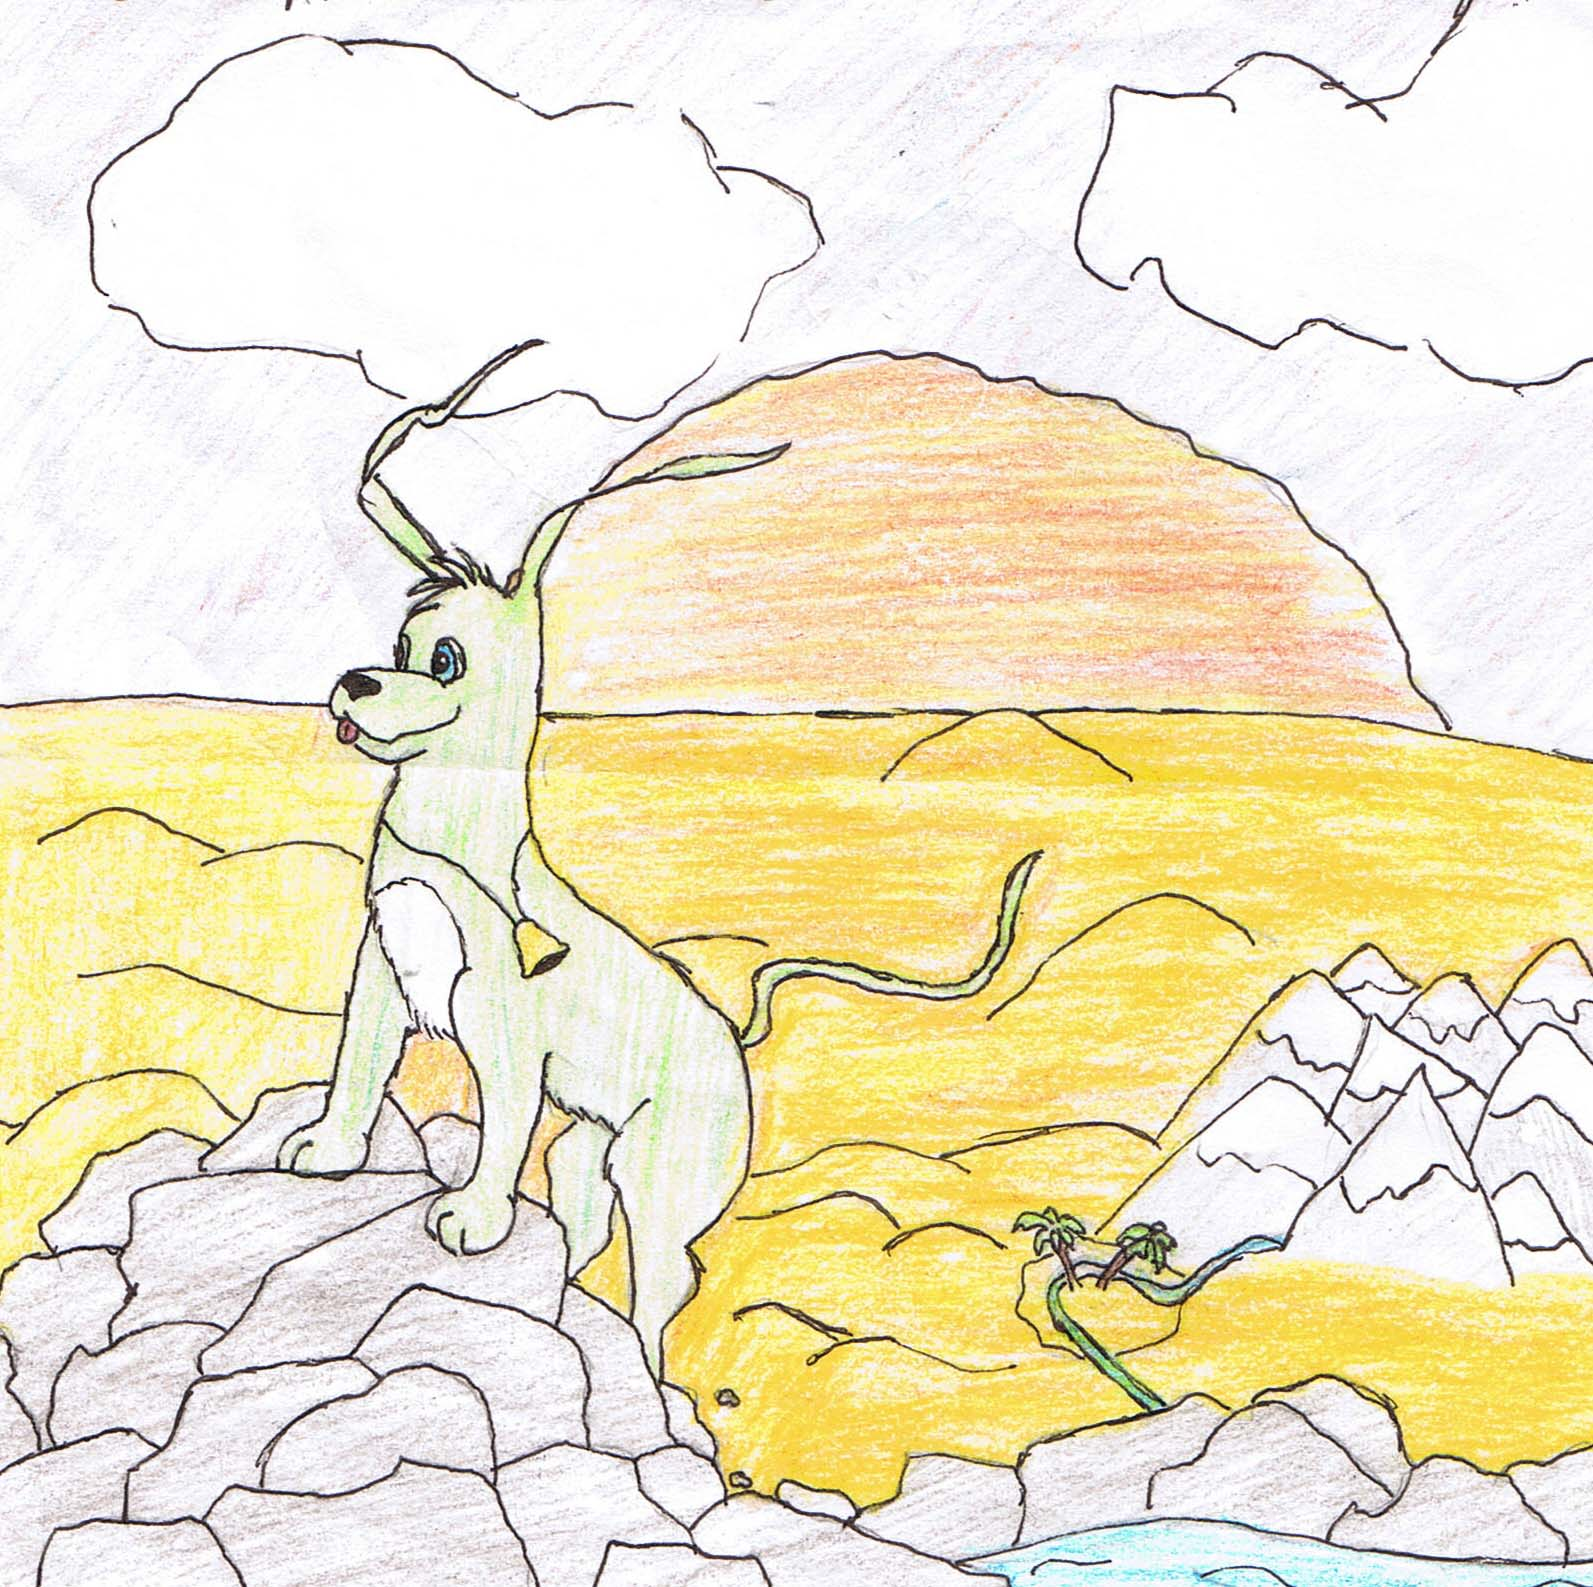 Sombheart by Pabbit_da_Rabbit